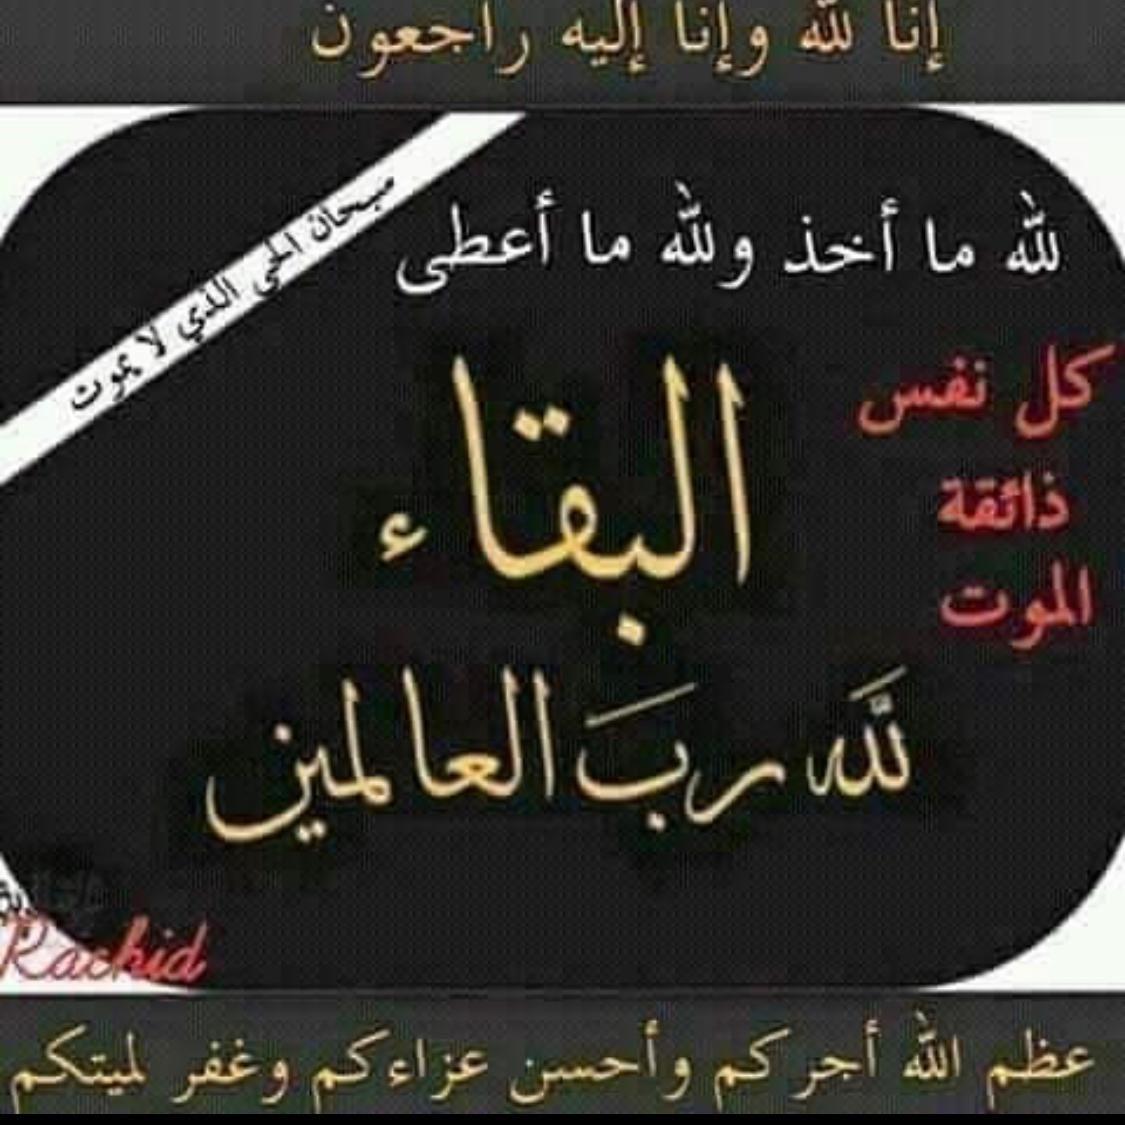 Pin By Slyn1s On صور خاص بي الكاميرا Arabic Calligraphy